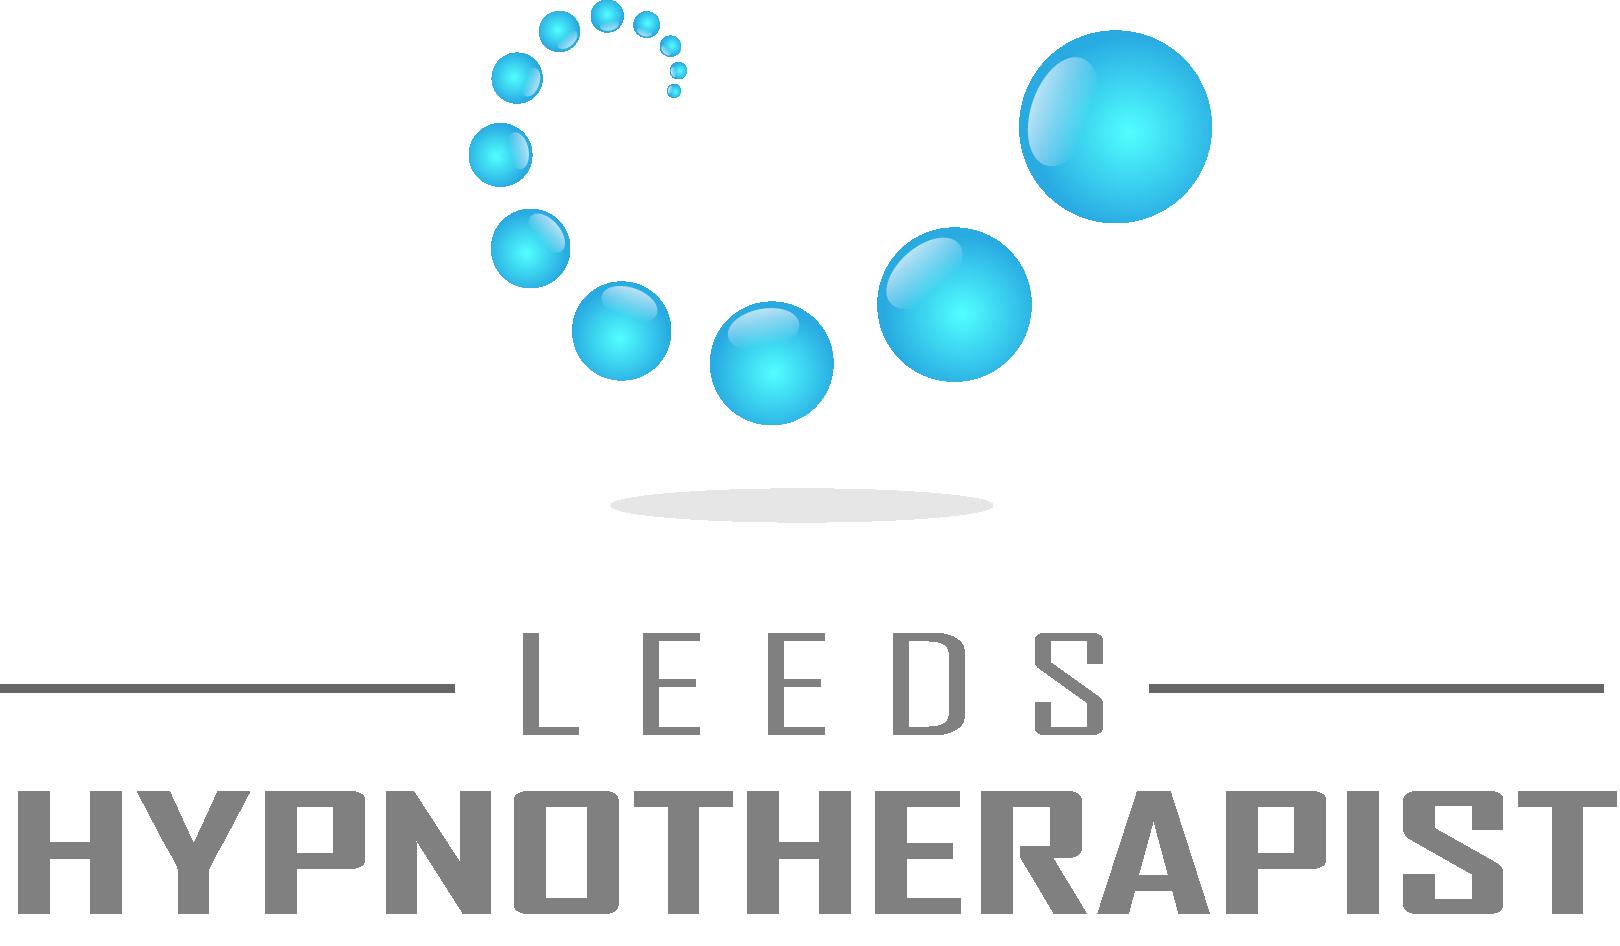 The Leeds Hypnotherapist